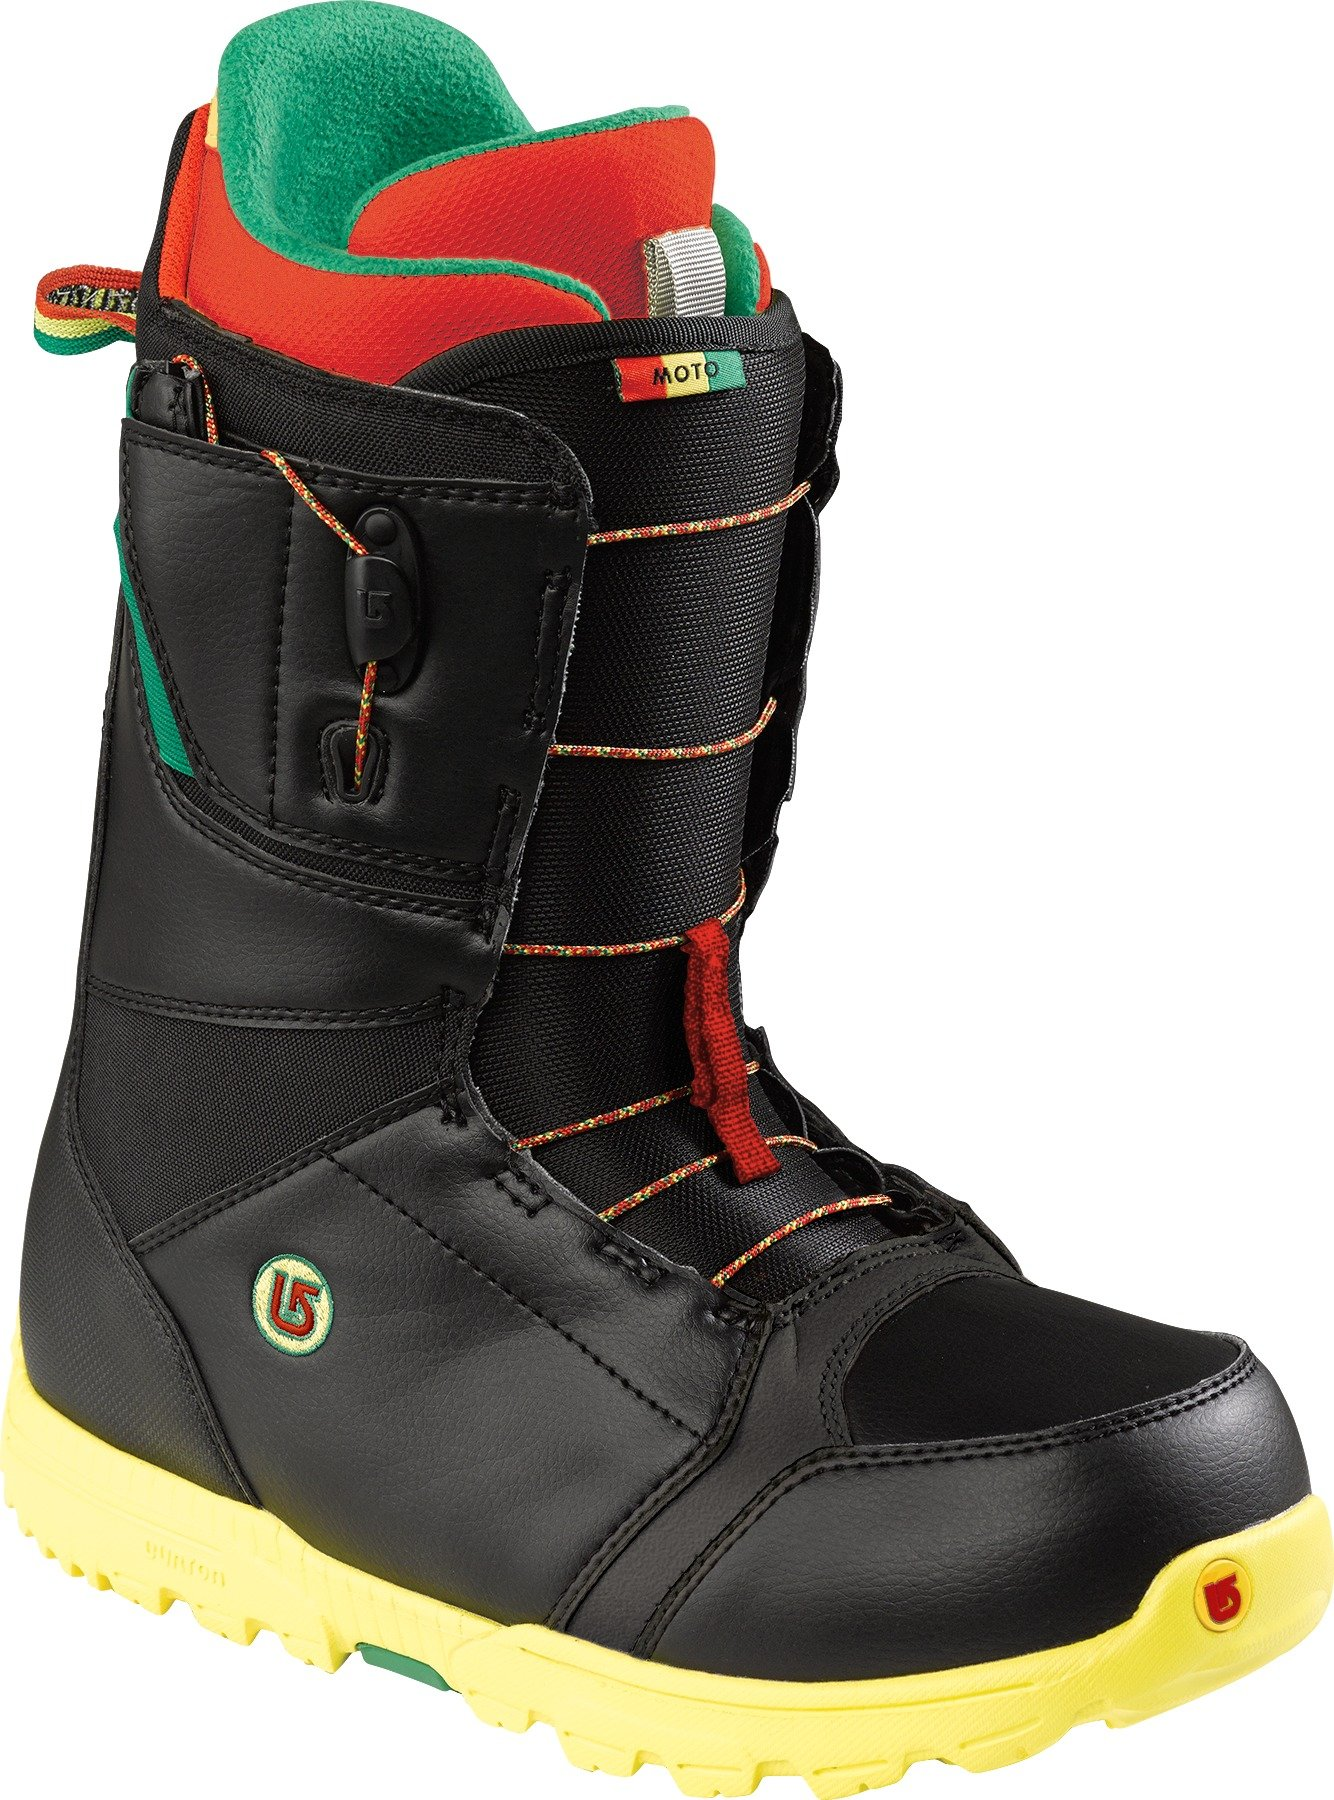 Burton Men's Moto Snowboard Boots - Black